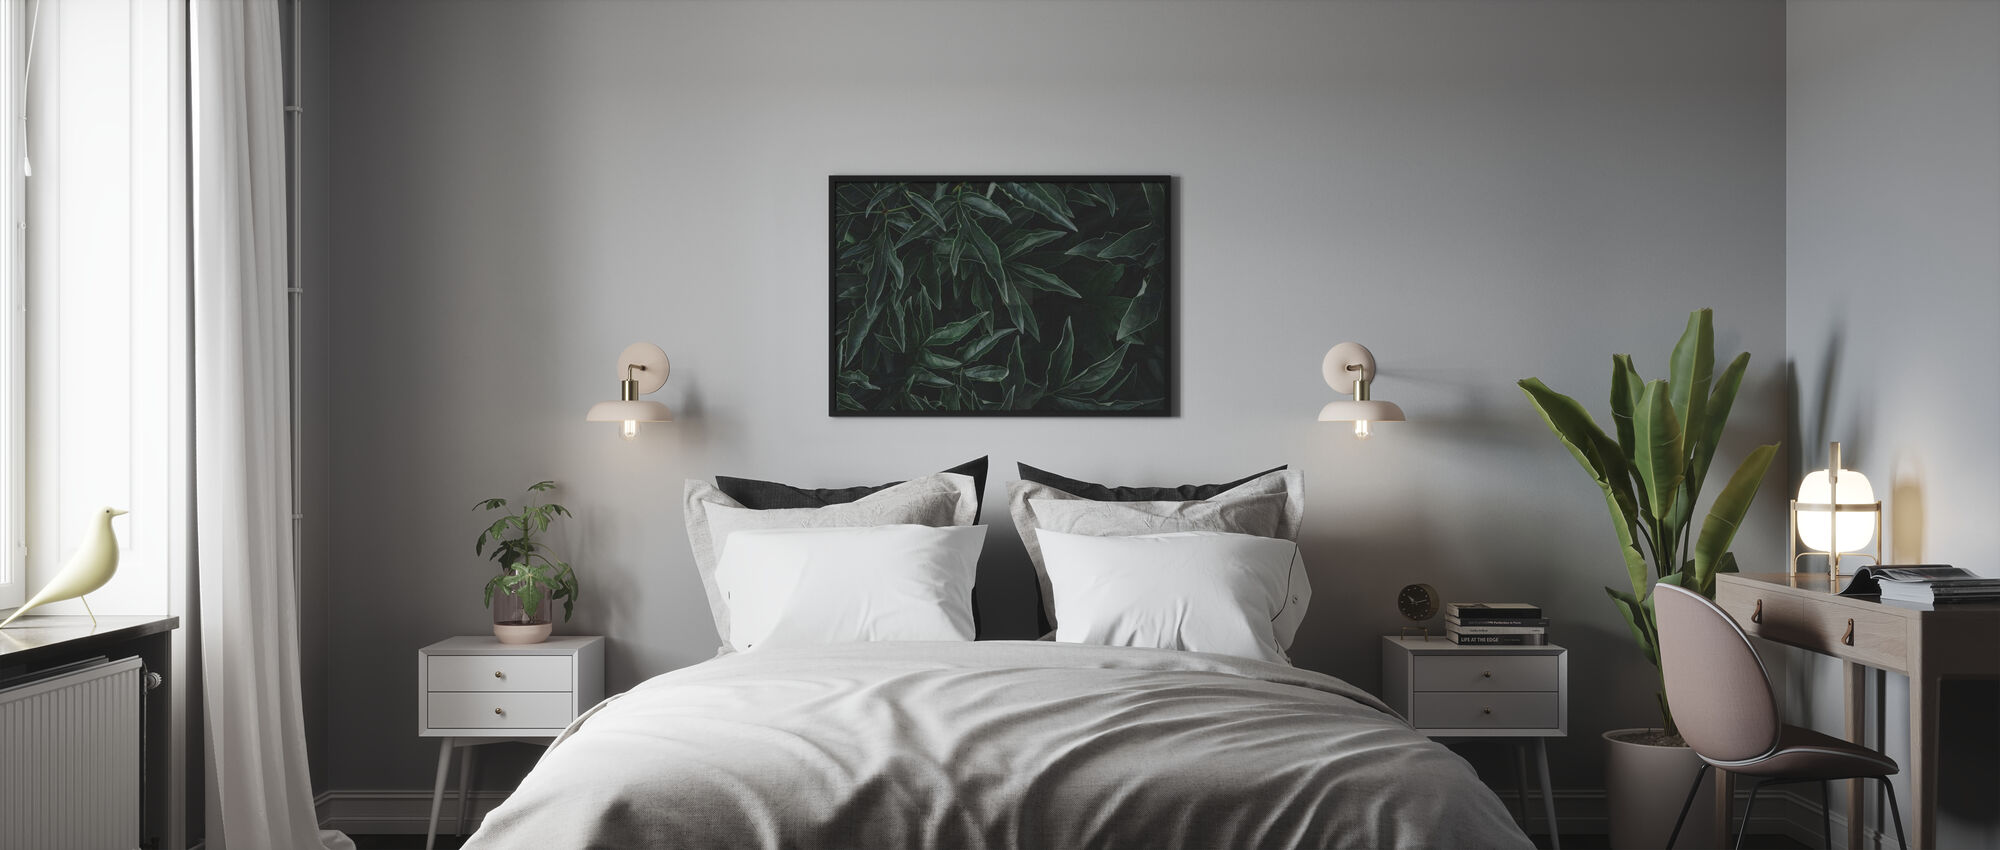 Lush - Poster - Bedroom